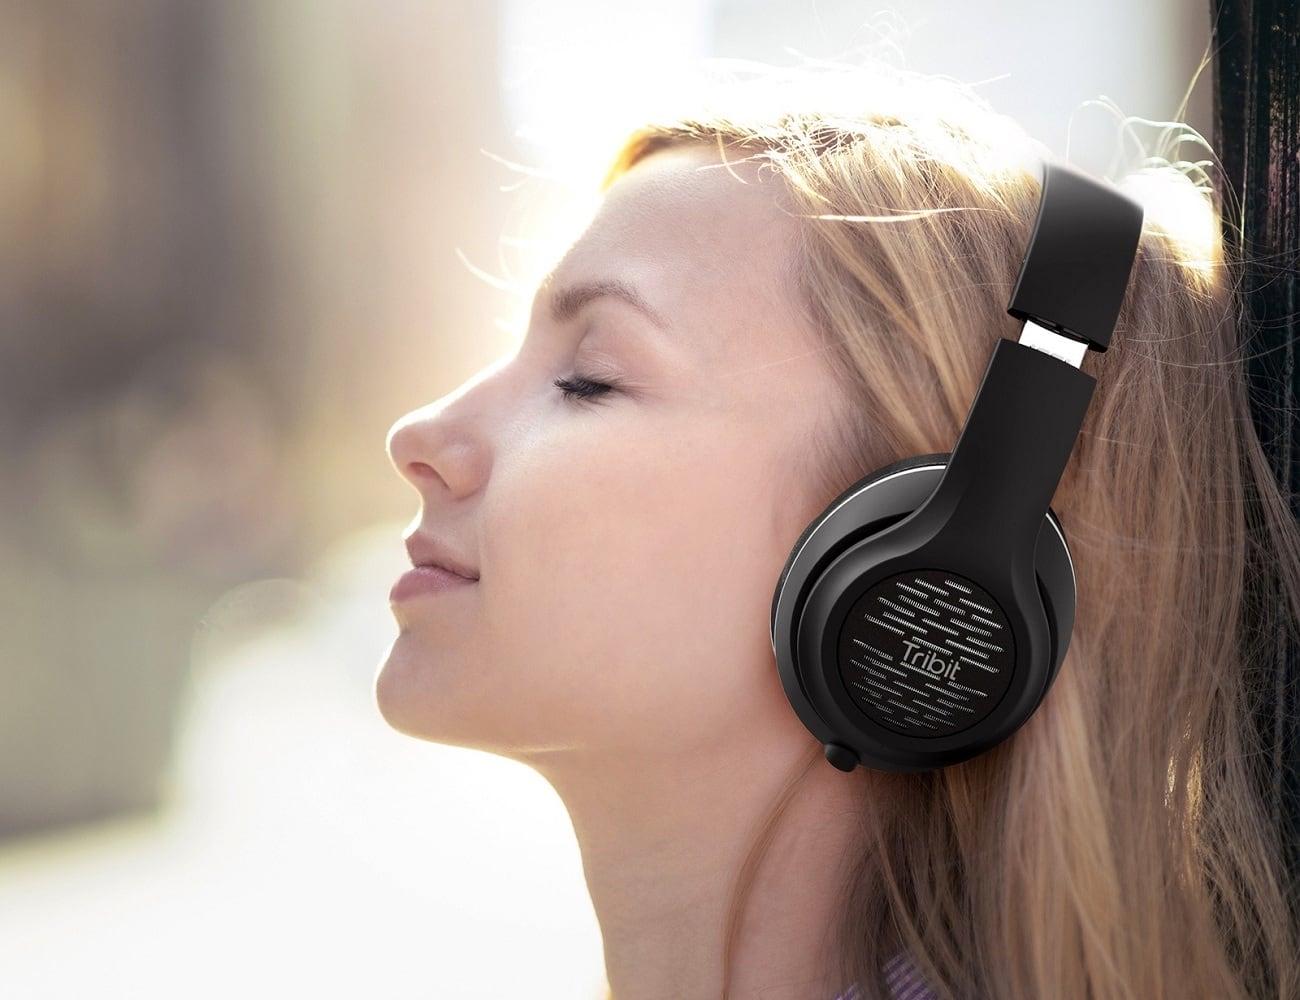 Tribit XFree Tune Over-Ear Bluetooth Headphones